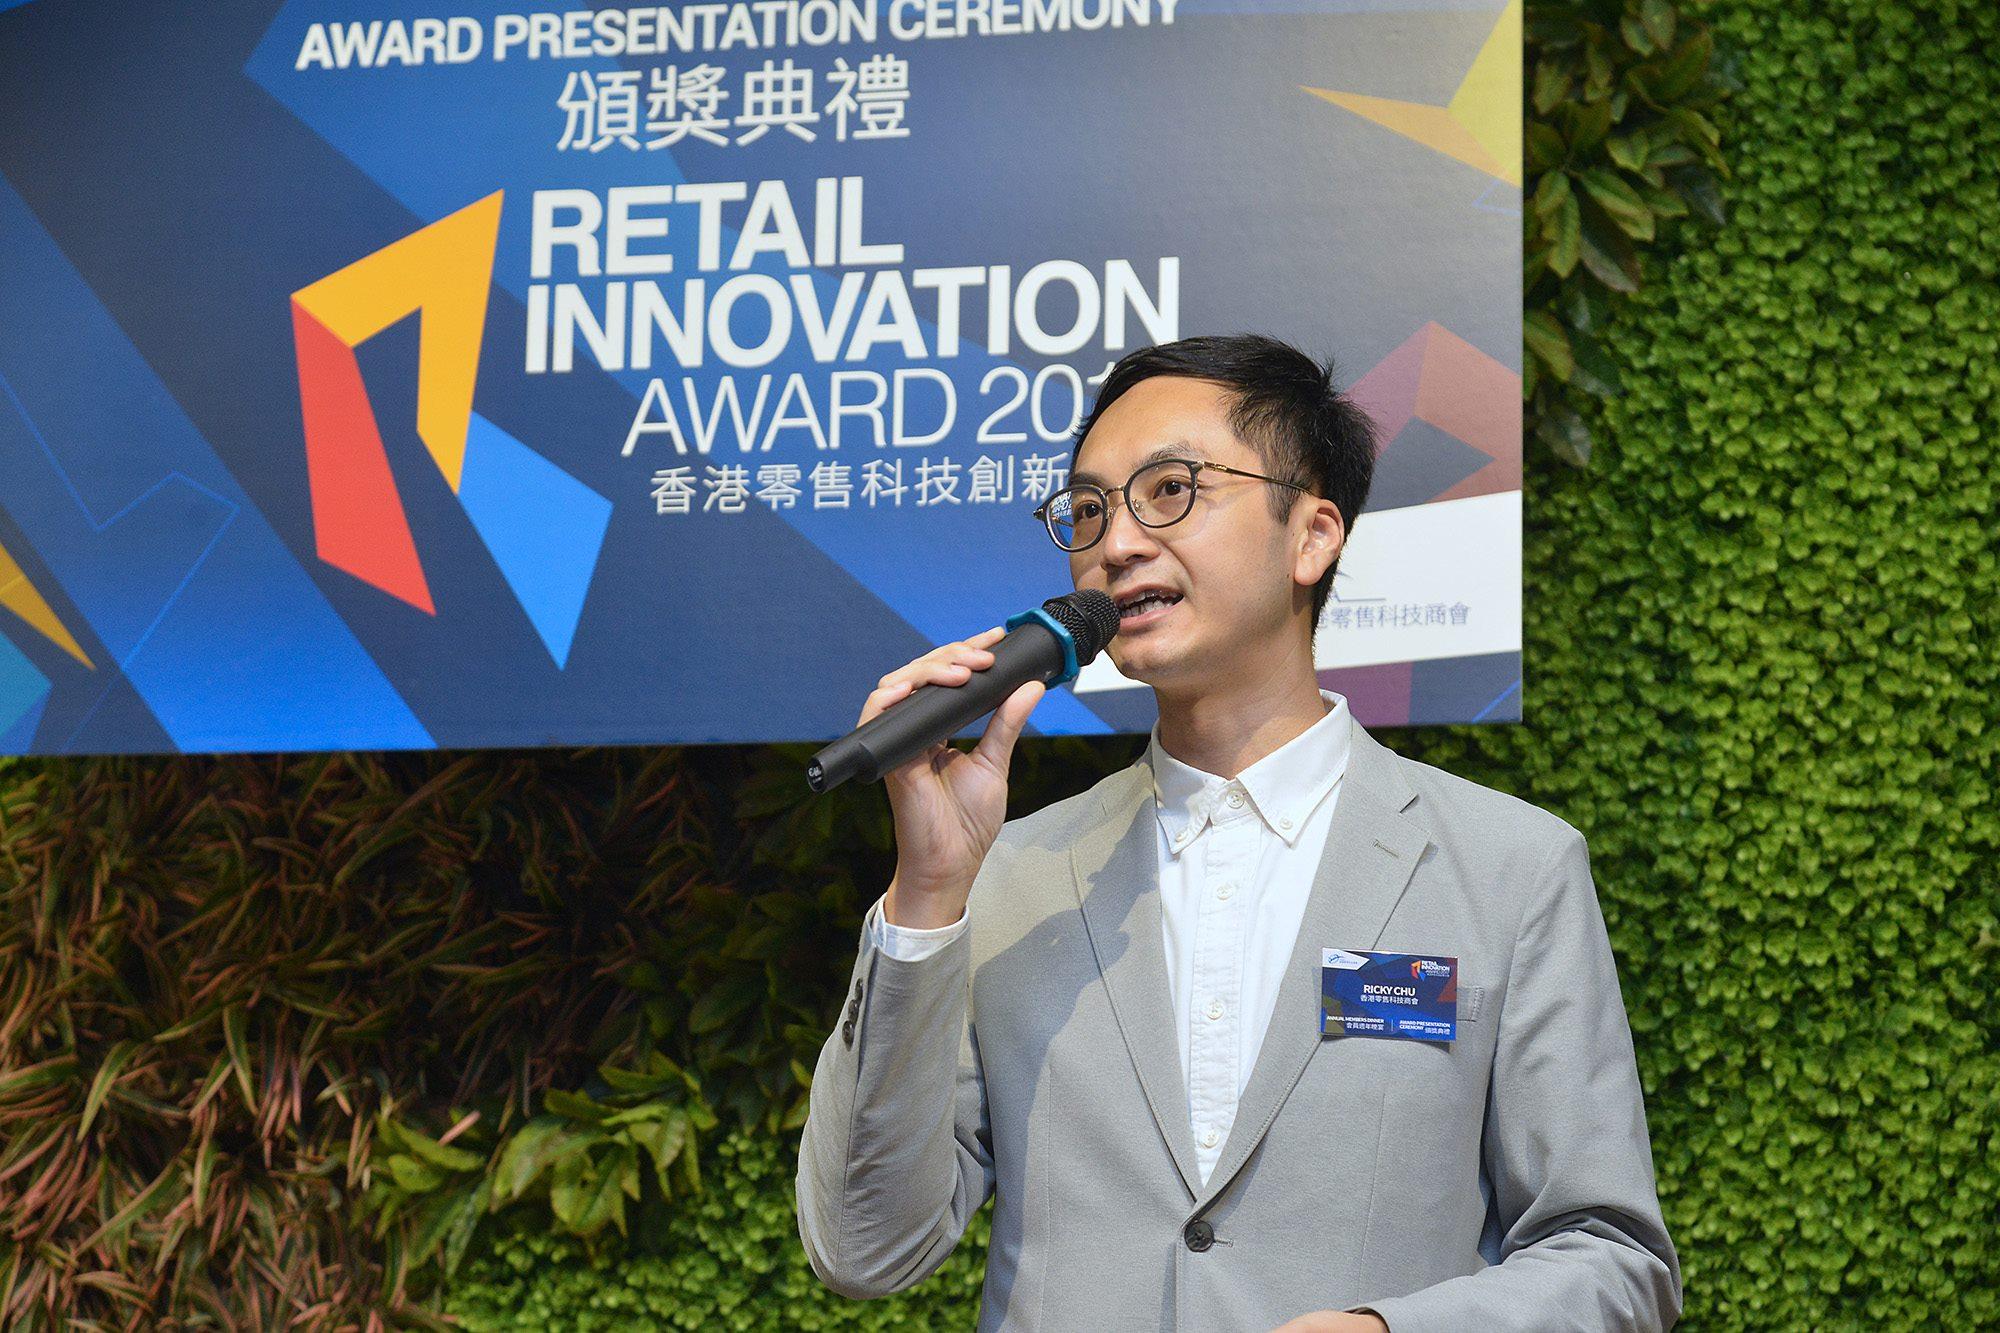 C-star at The Retail Innovation Award 2017